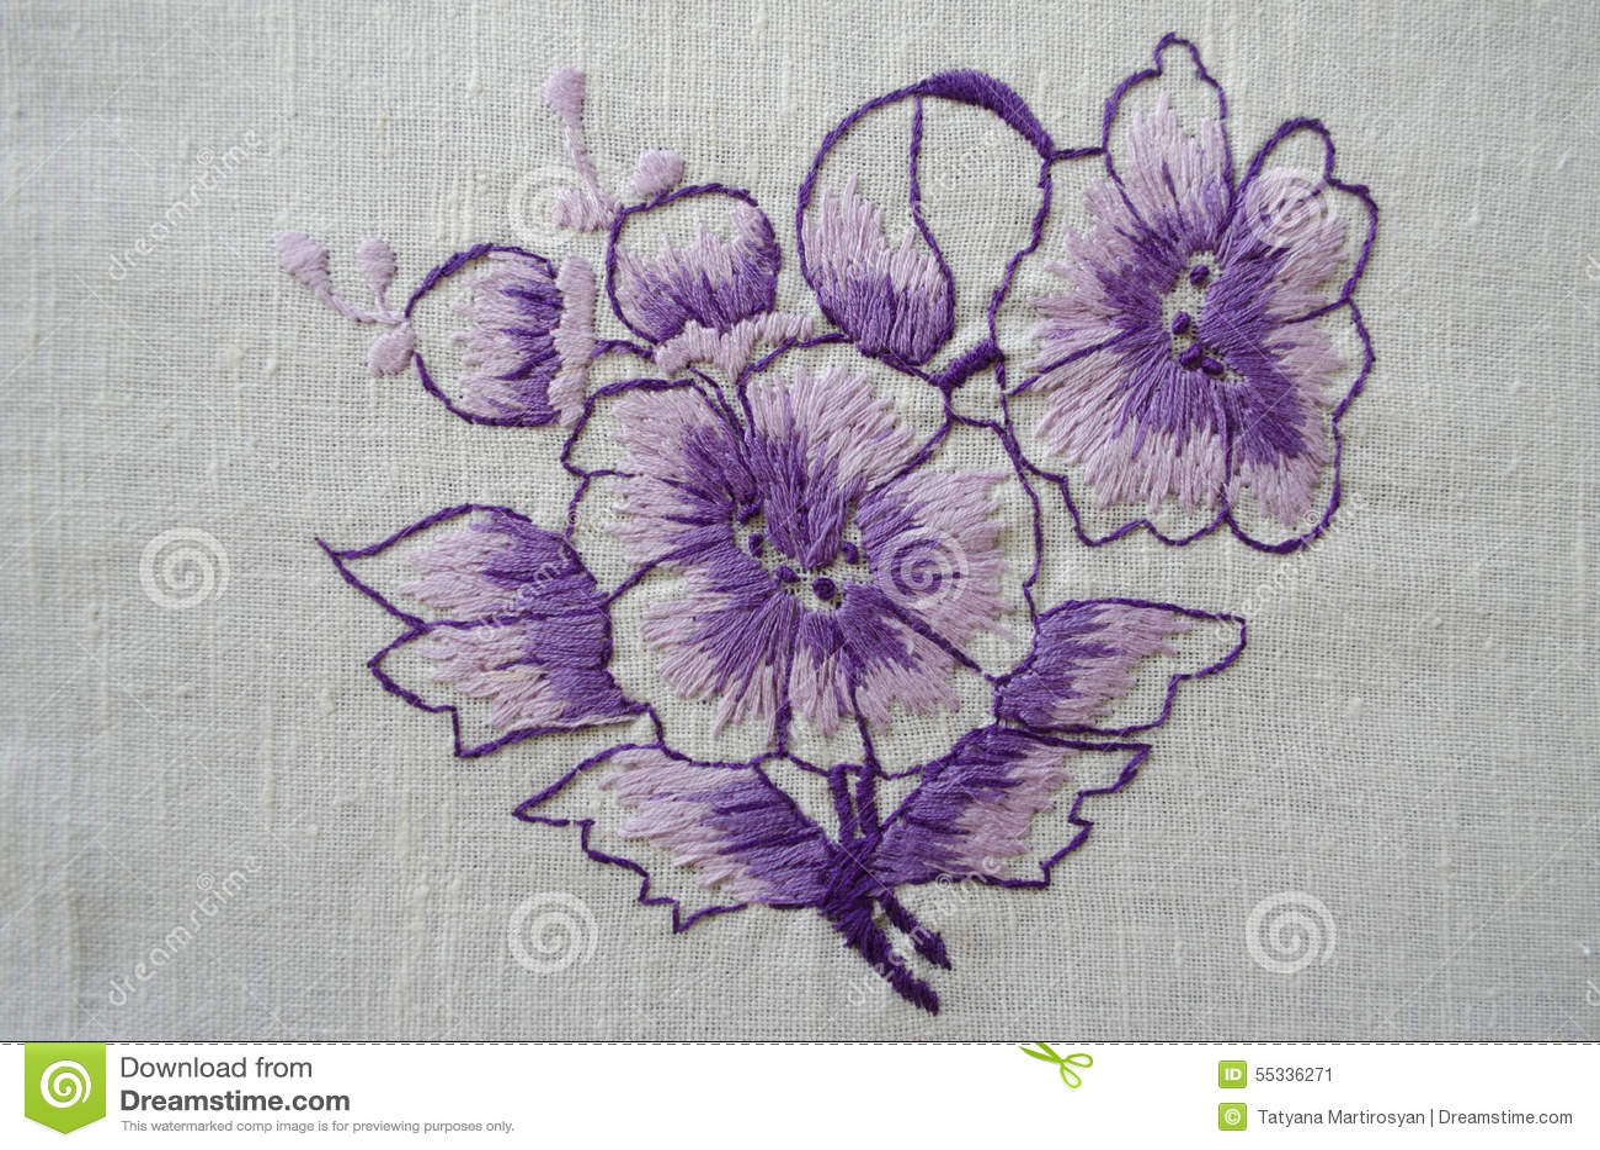 Embroidered Satin Stitch Purple Flower On Cotton Cloth Stock Illustration Illustration Of Object Cotton 55336271